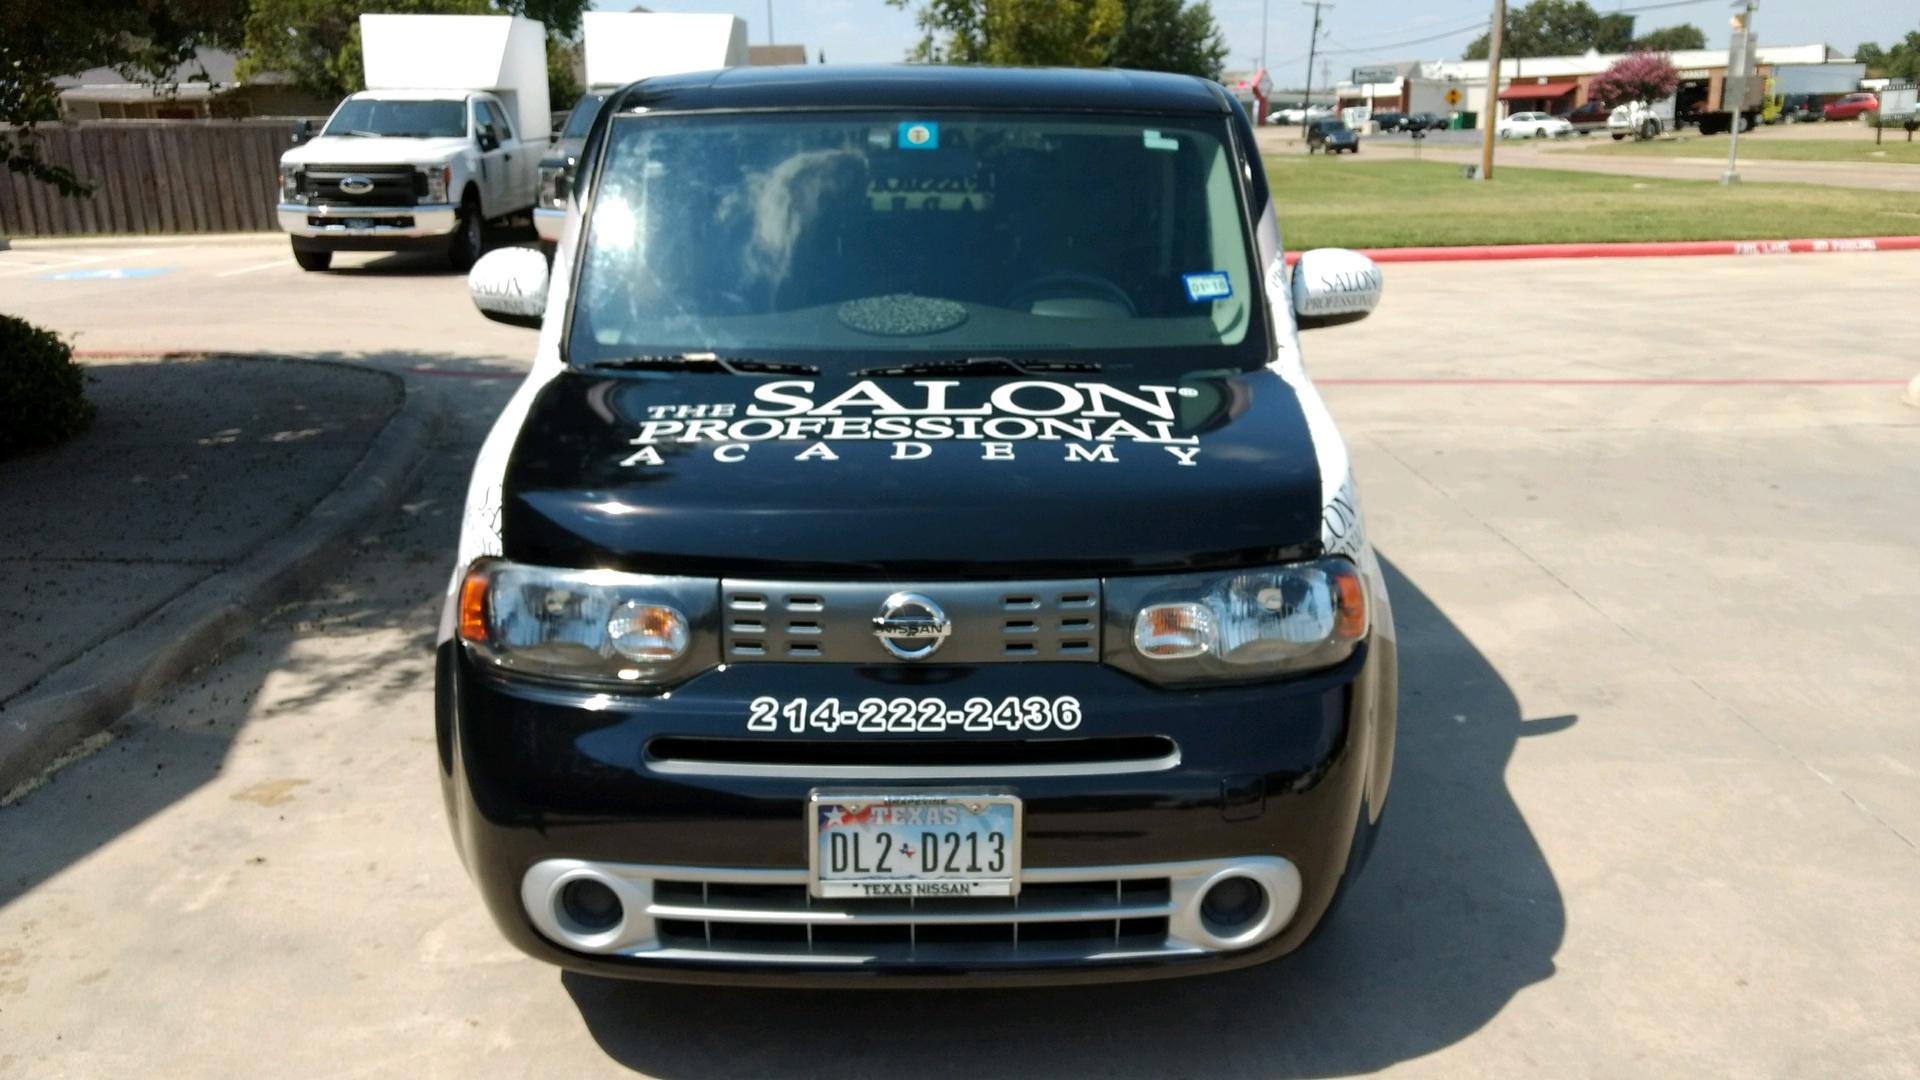 Cars - Custom Car Wraps, Custom Decals, Vehicle Wraps, Car Wraps